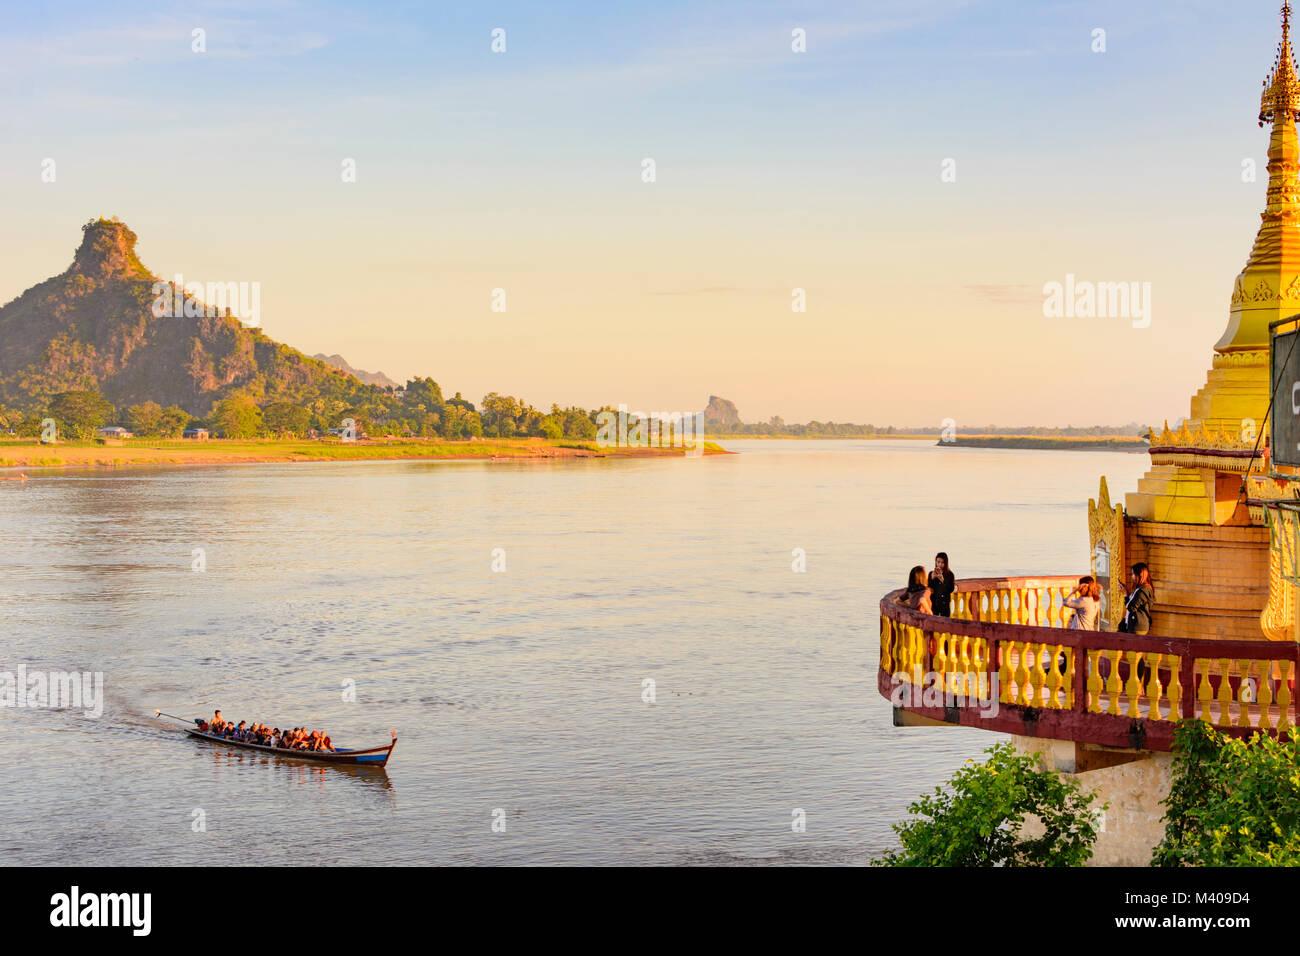 Hpa-An: Thanlwin (Salween) River, Shweyinhmyaw Paya temple pagoda, mount Hpan Pu, boat, , Kayin (Karen) State, Myanmar Stock Photo